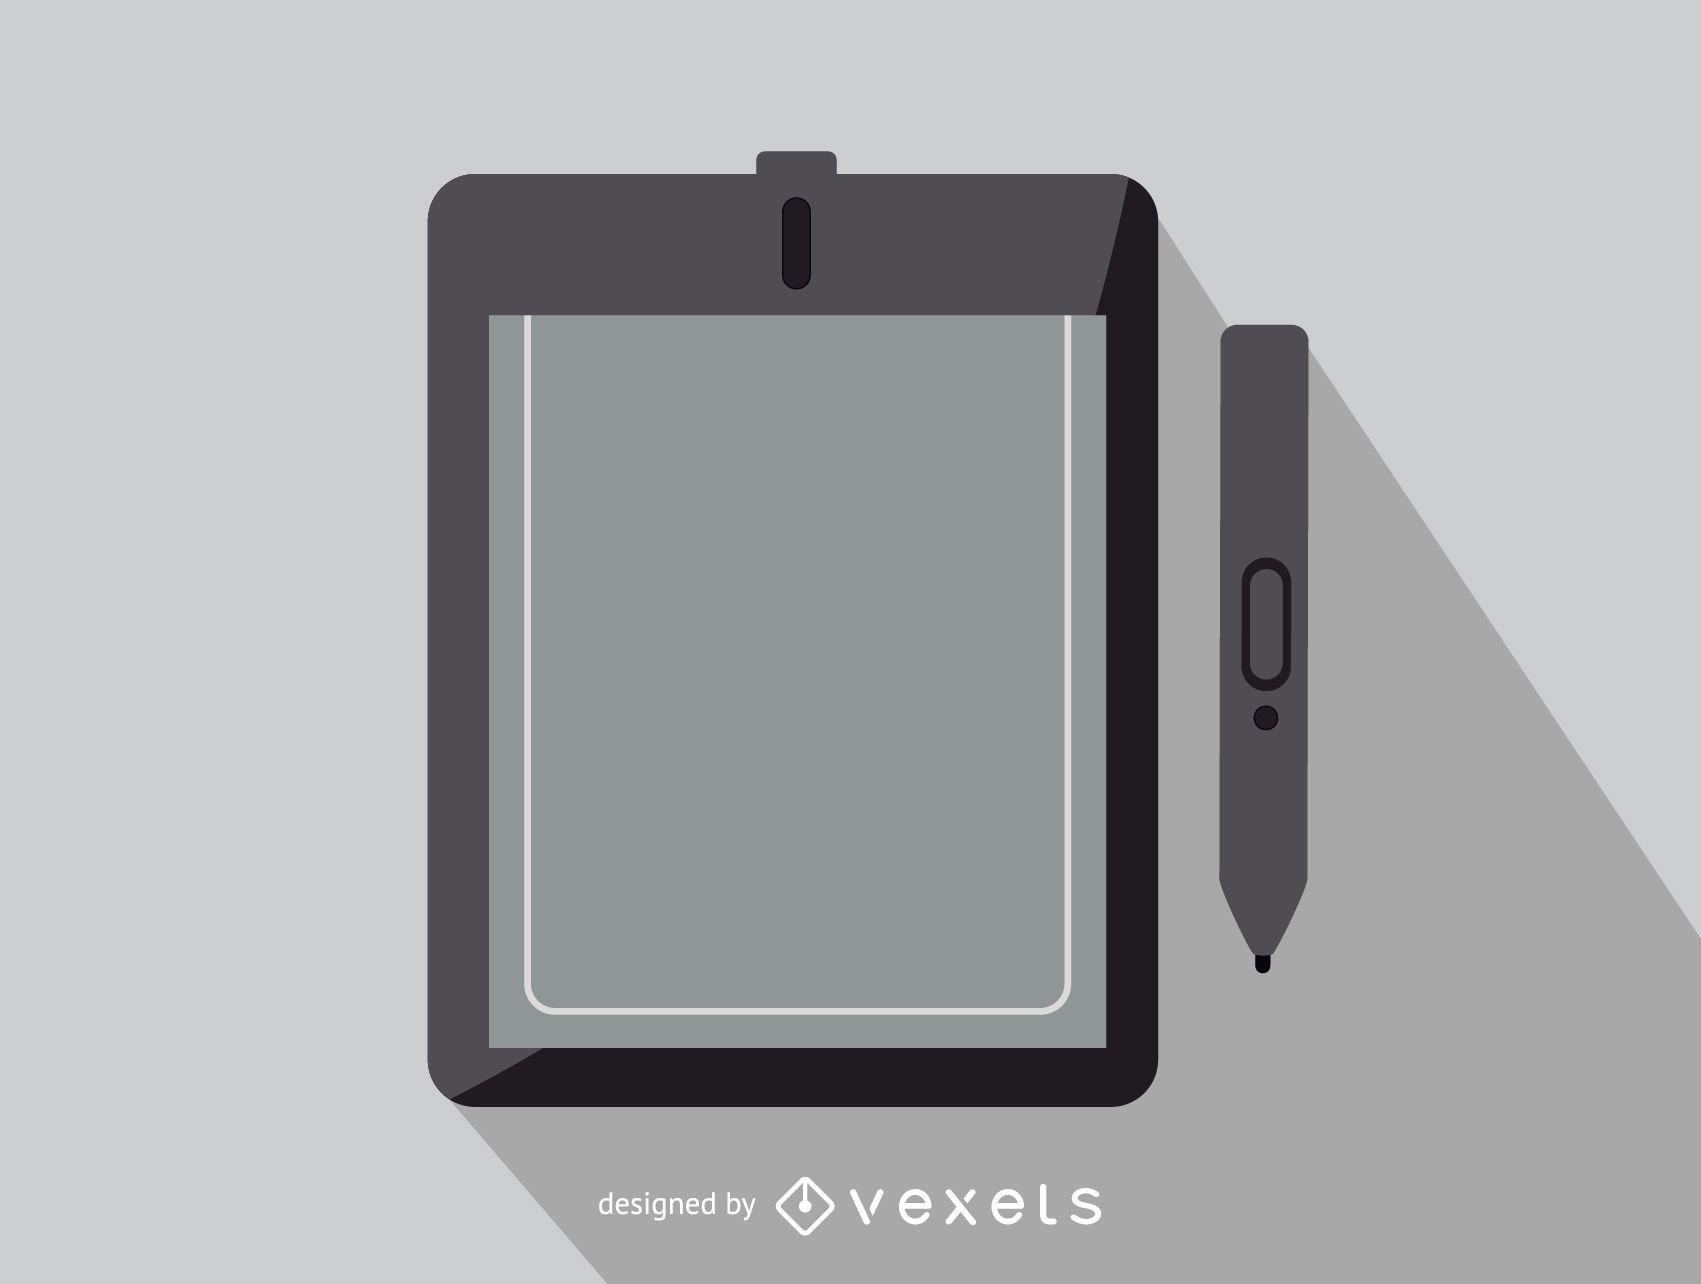 Icono de oficina de tableta gráfica